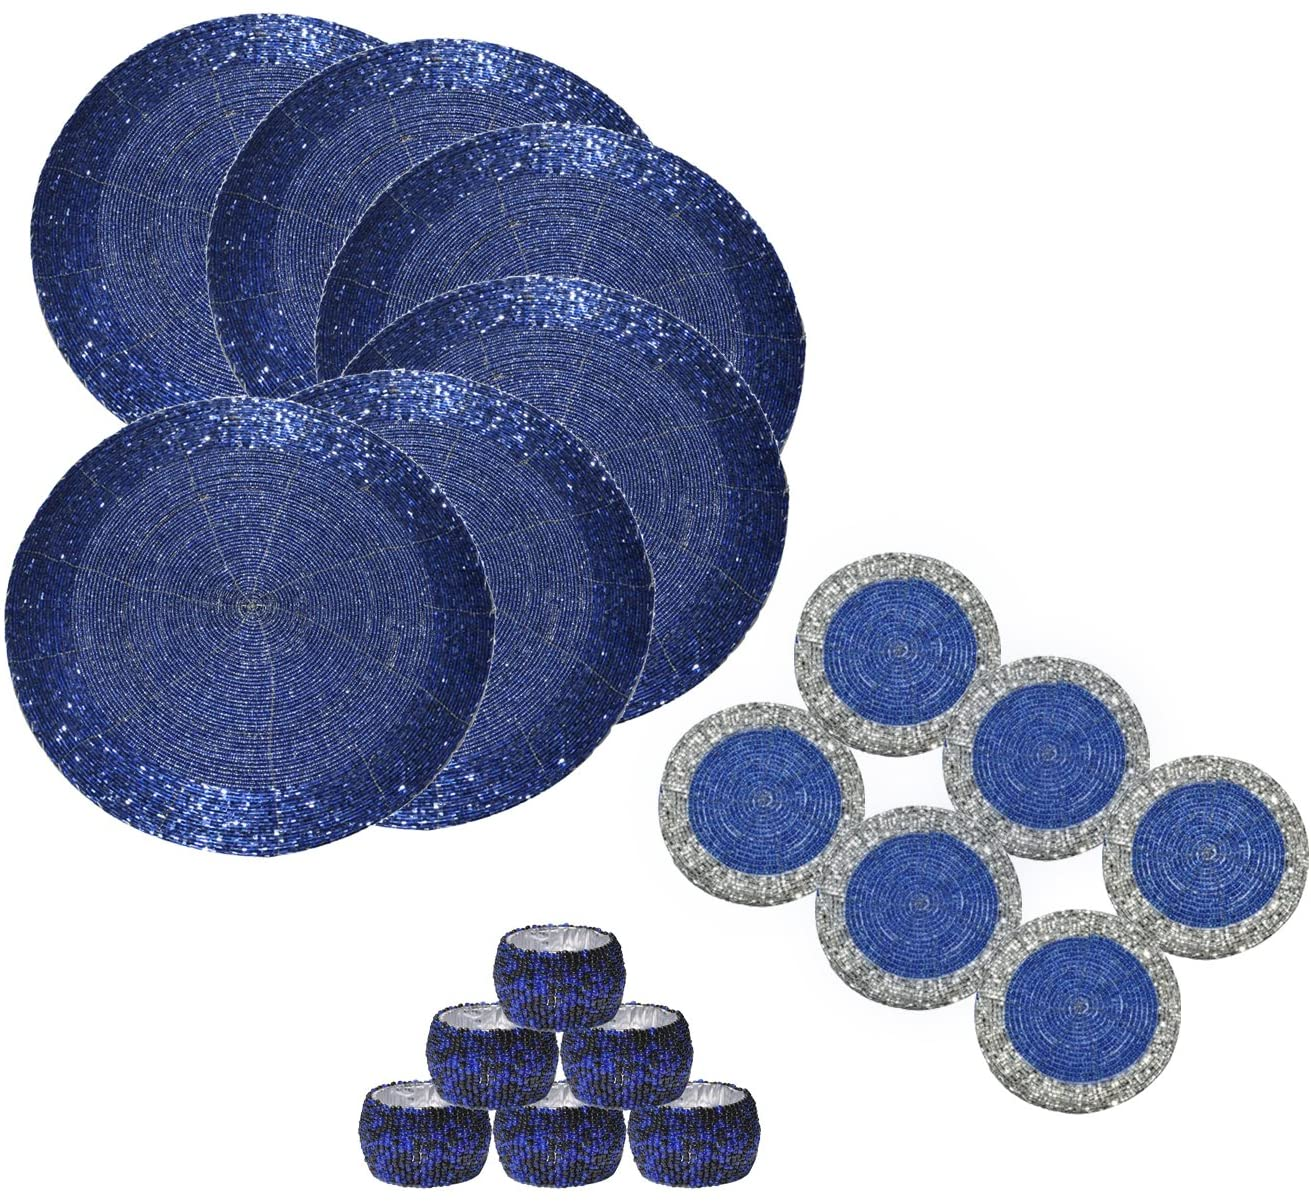 DakshCraft 6 Beaded Round Ethnic Placemat/Tablemat(Dia - 12